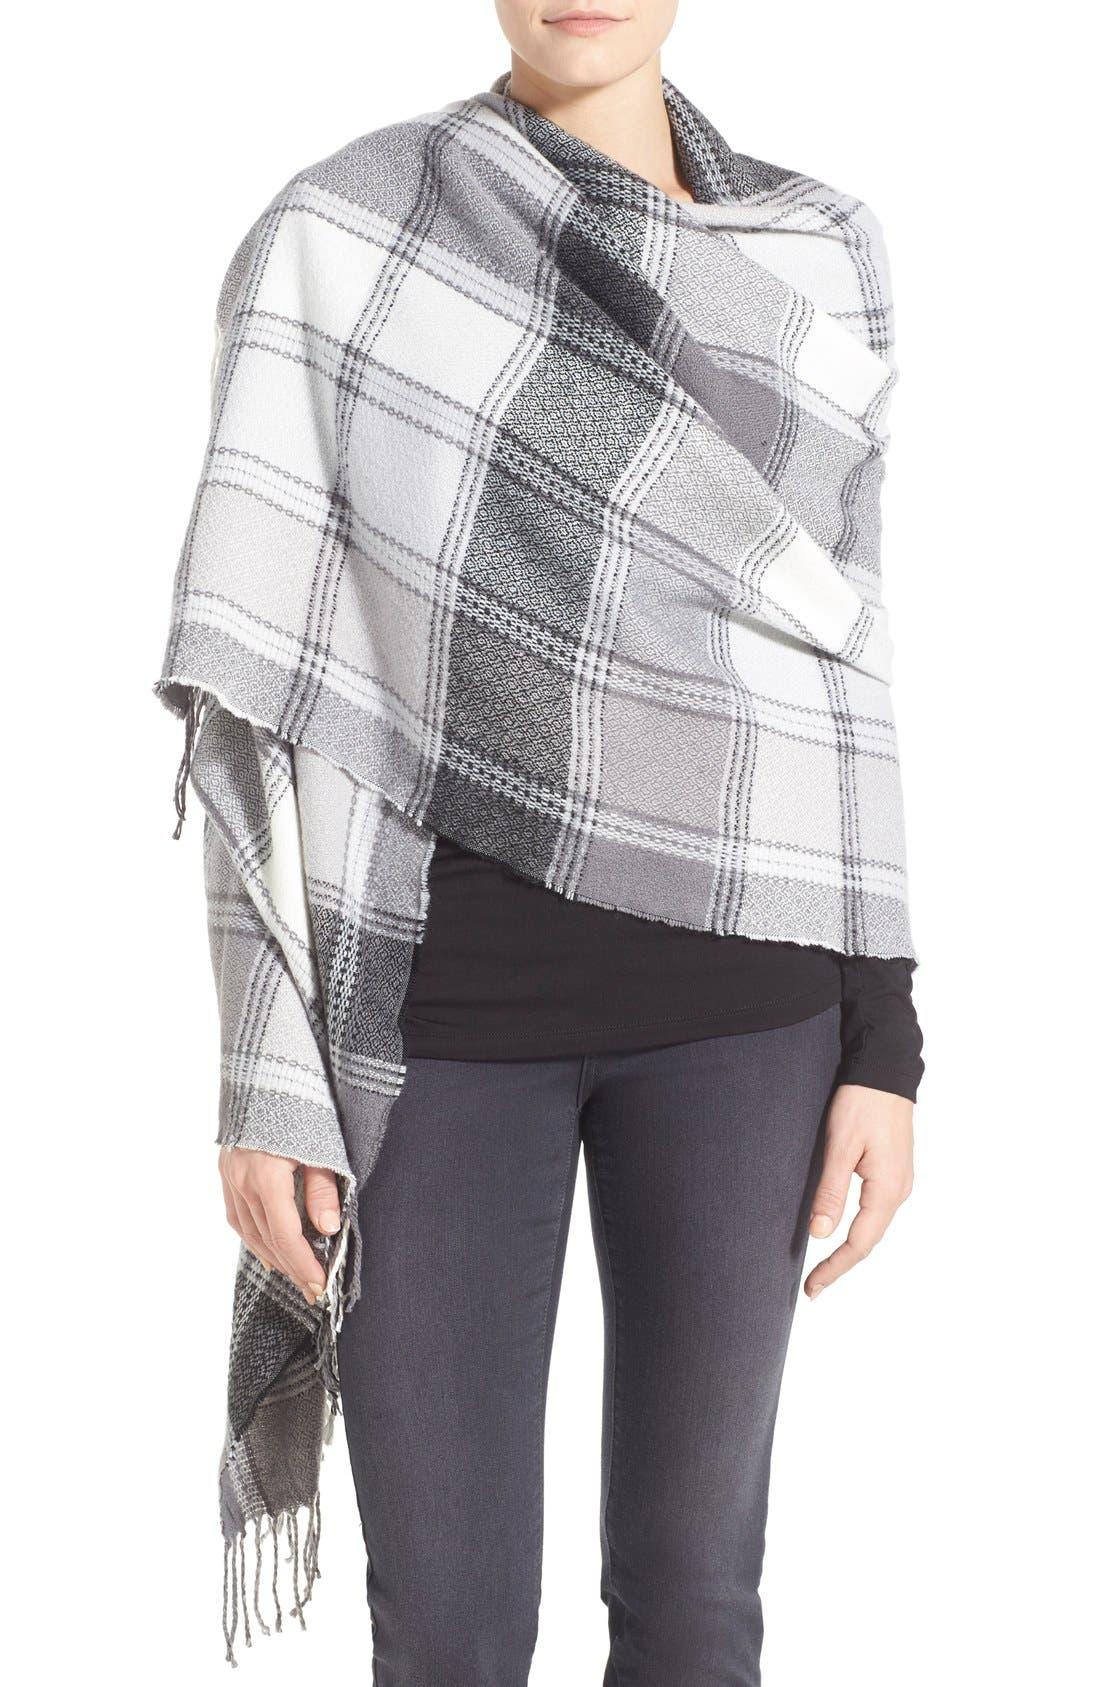 Alternate Image 1 Selected - Nordstrom Plaid Blanket Wrap